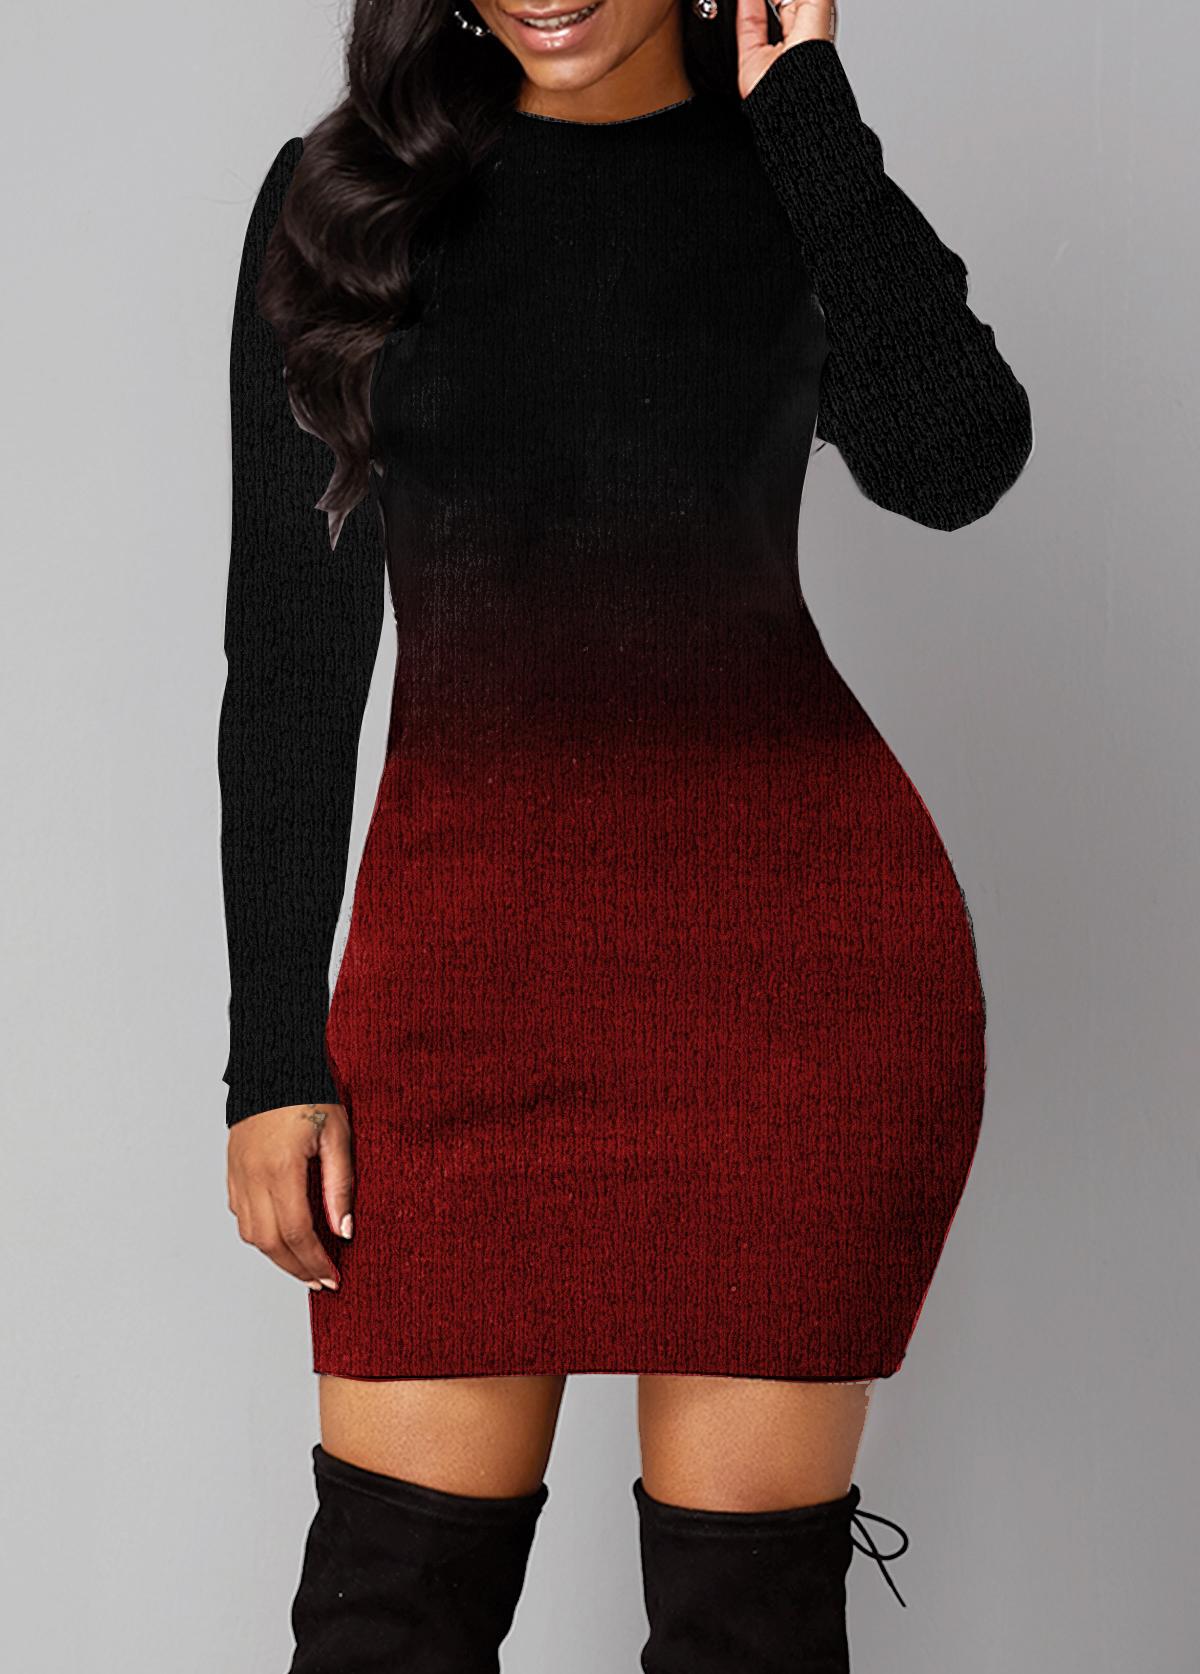 Round Neck Long Sleeve Gradient Sweater Dress